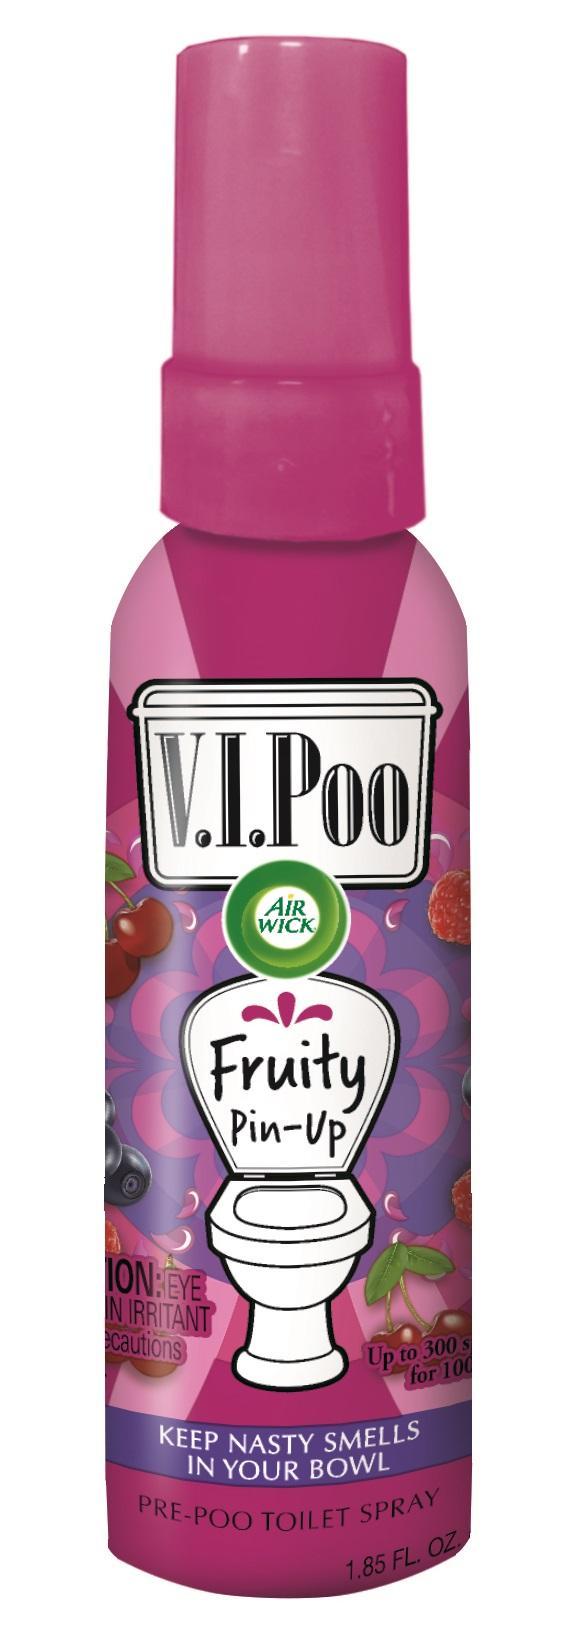 Air Wick V.I. Poo Pre-Poo Toilet Spray, Fruity Pin-Up, 1.9 oz Spray Bottle, 6/Carton